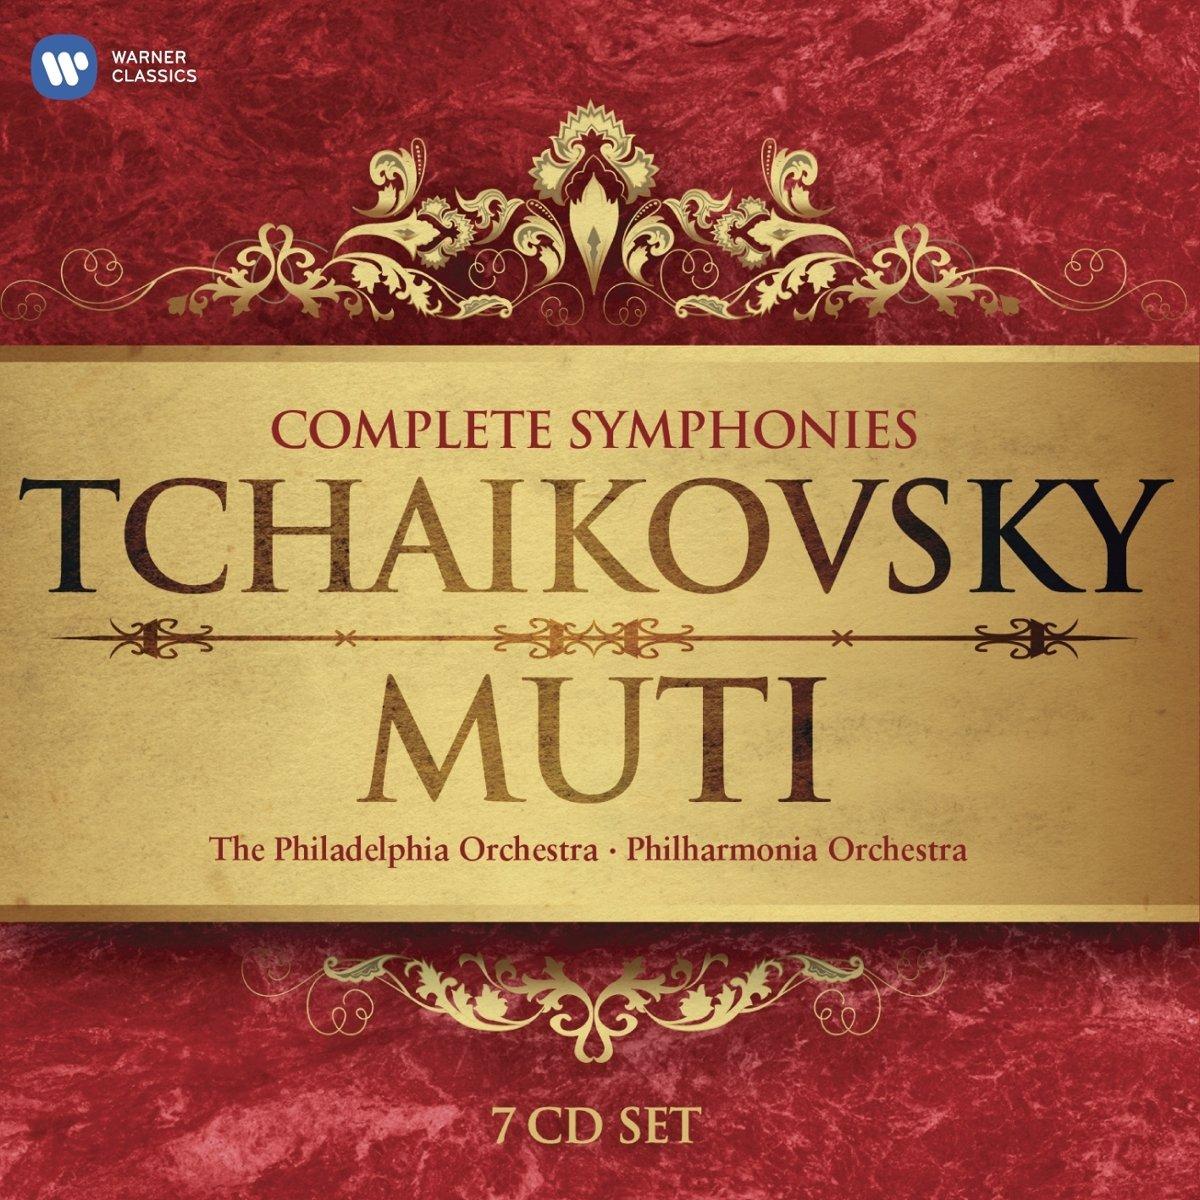 Como Descargar En Elitetorrent Complete Symphonies (ballet Music) R.muttii Libro PDF